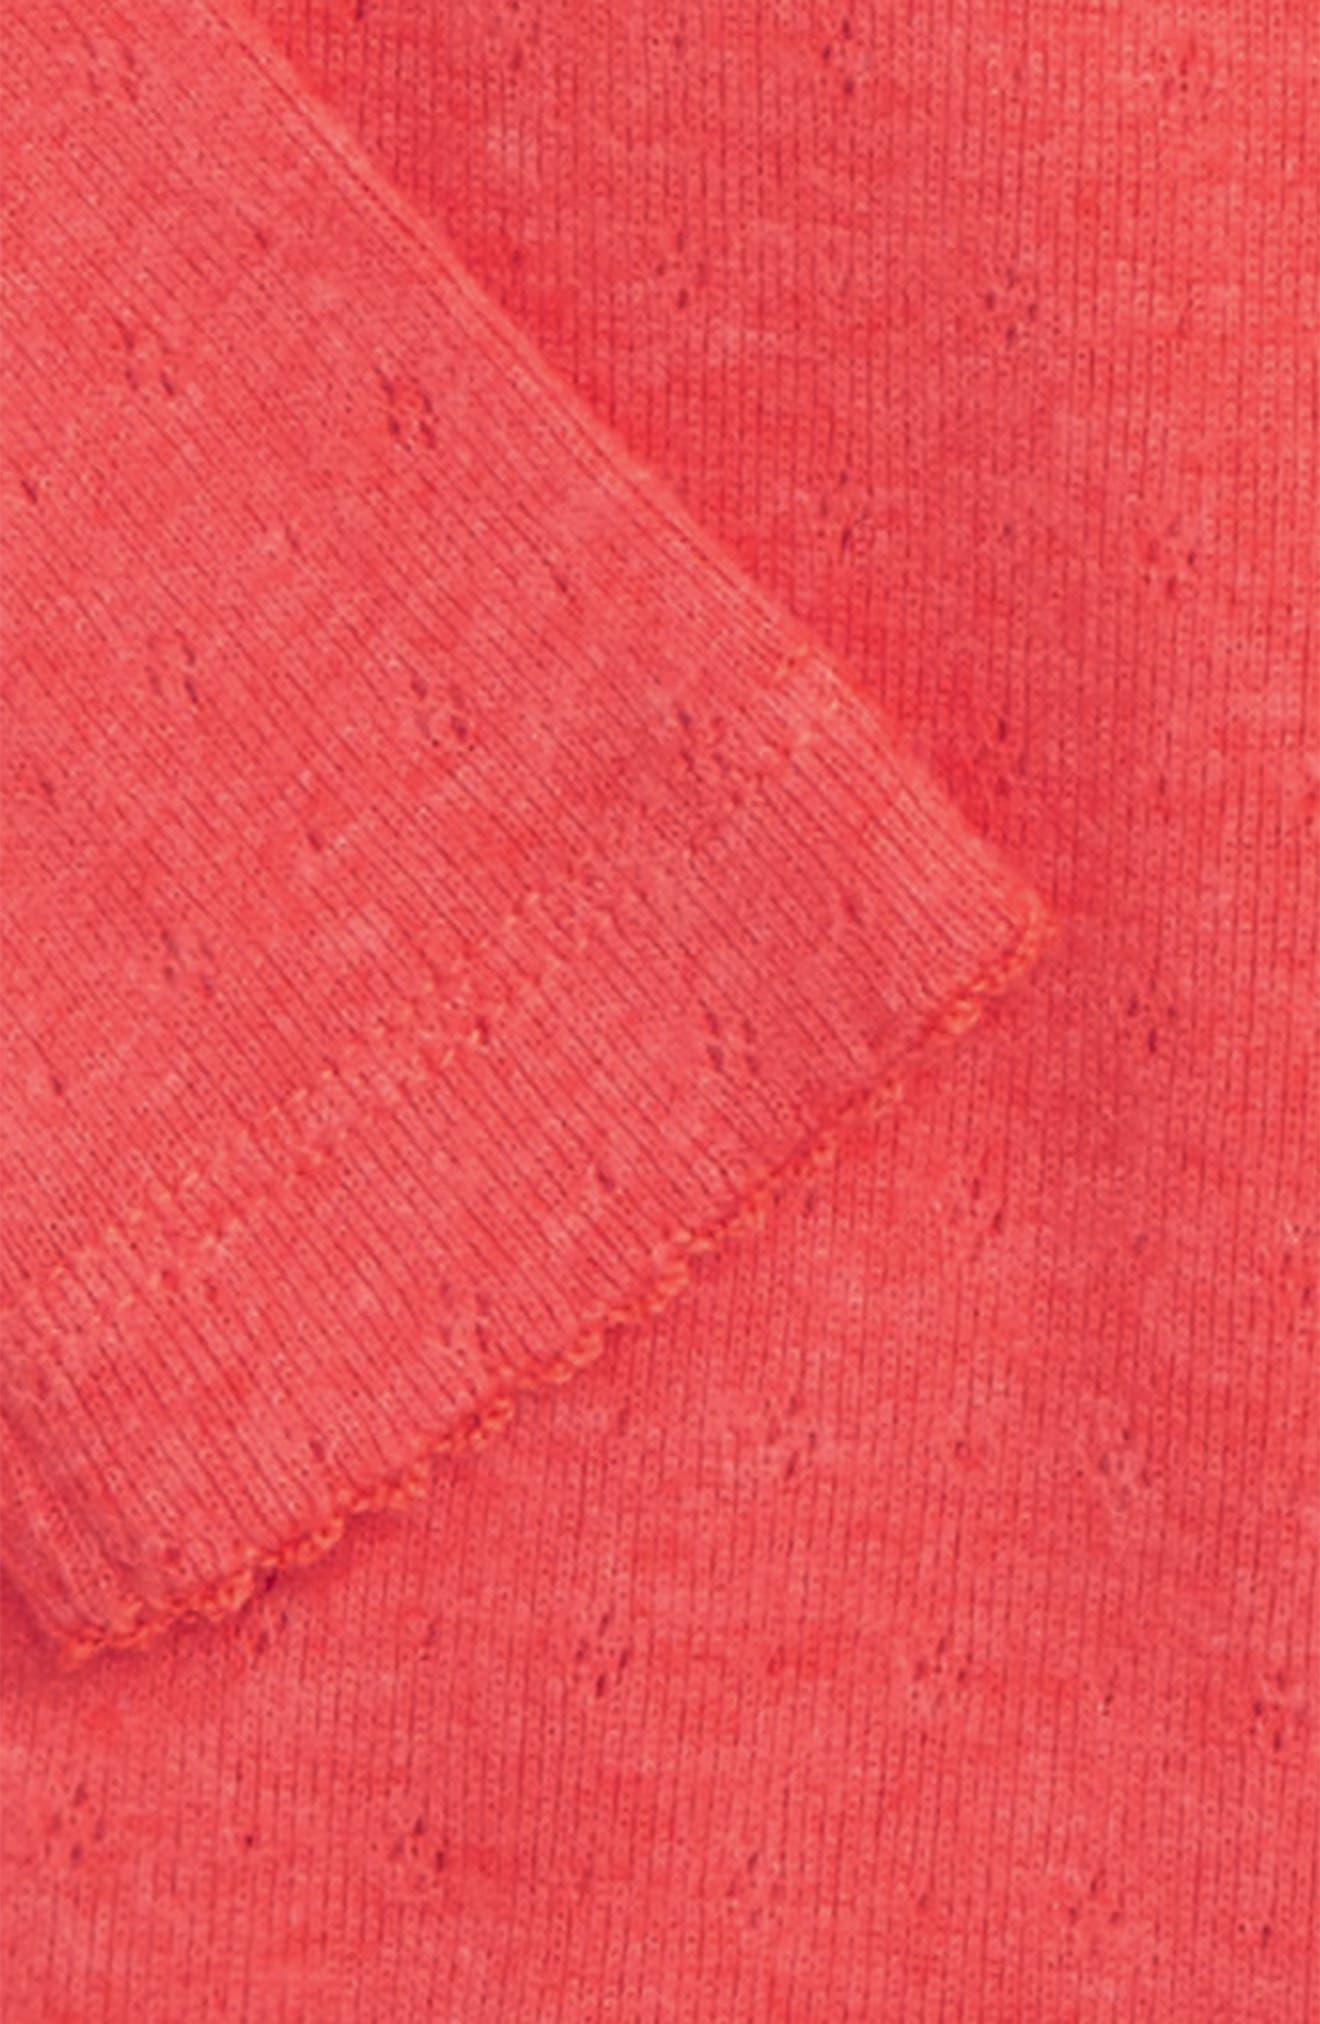 Supersoft Pointelle Bodysuit,                             Alternate thumbnail 2, color,                             Red Jam